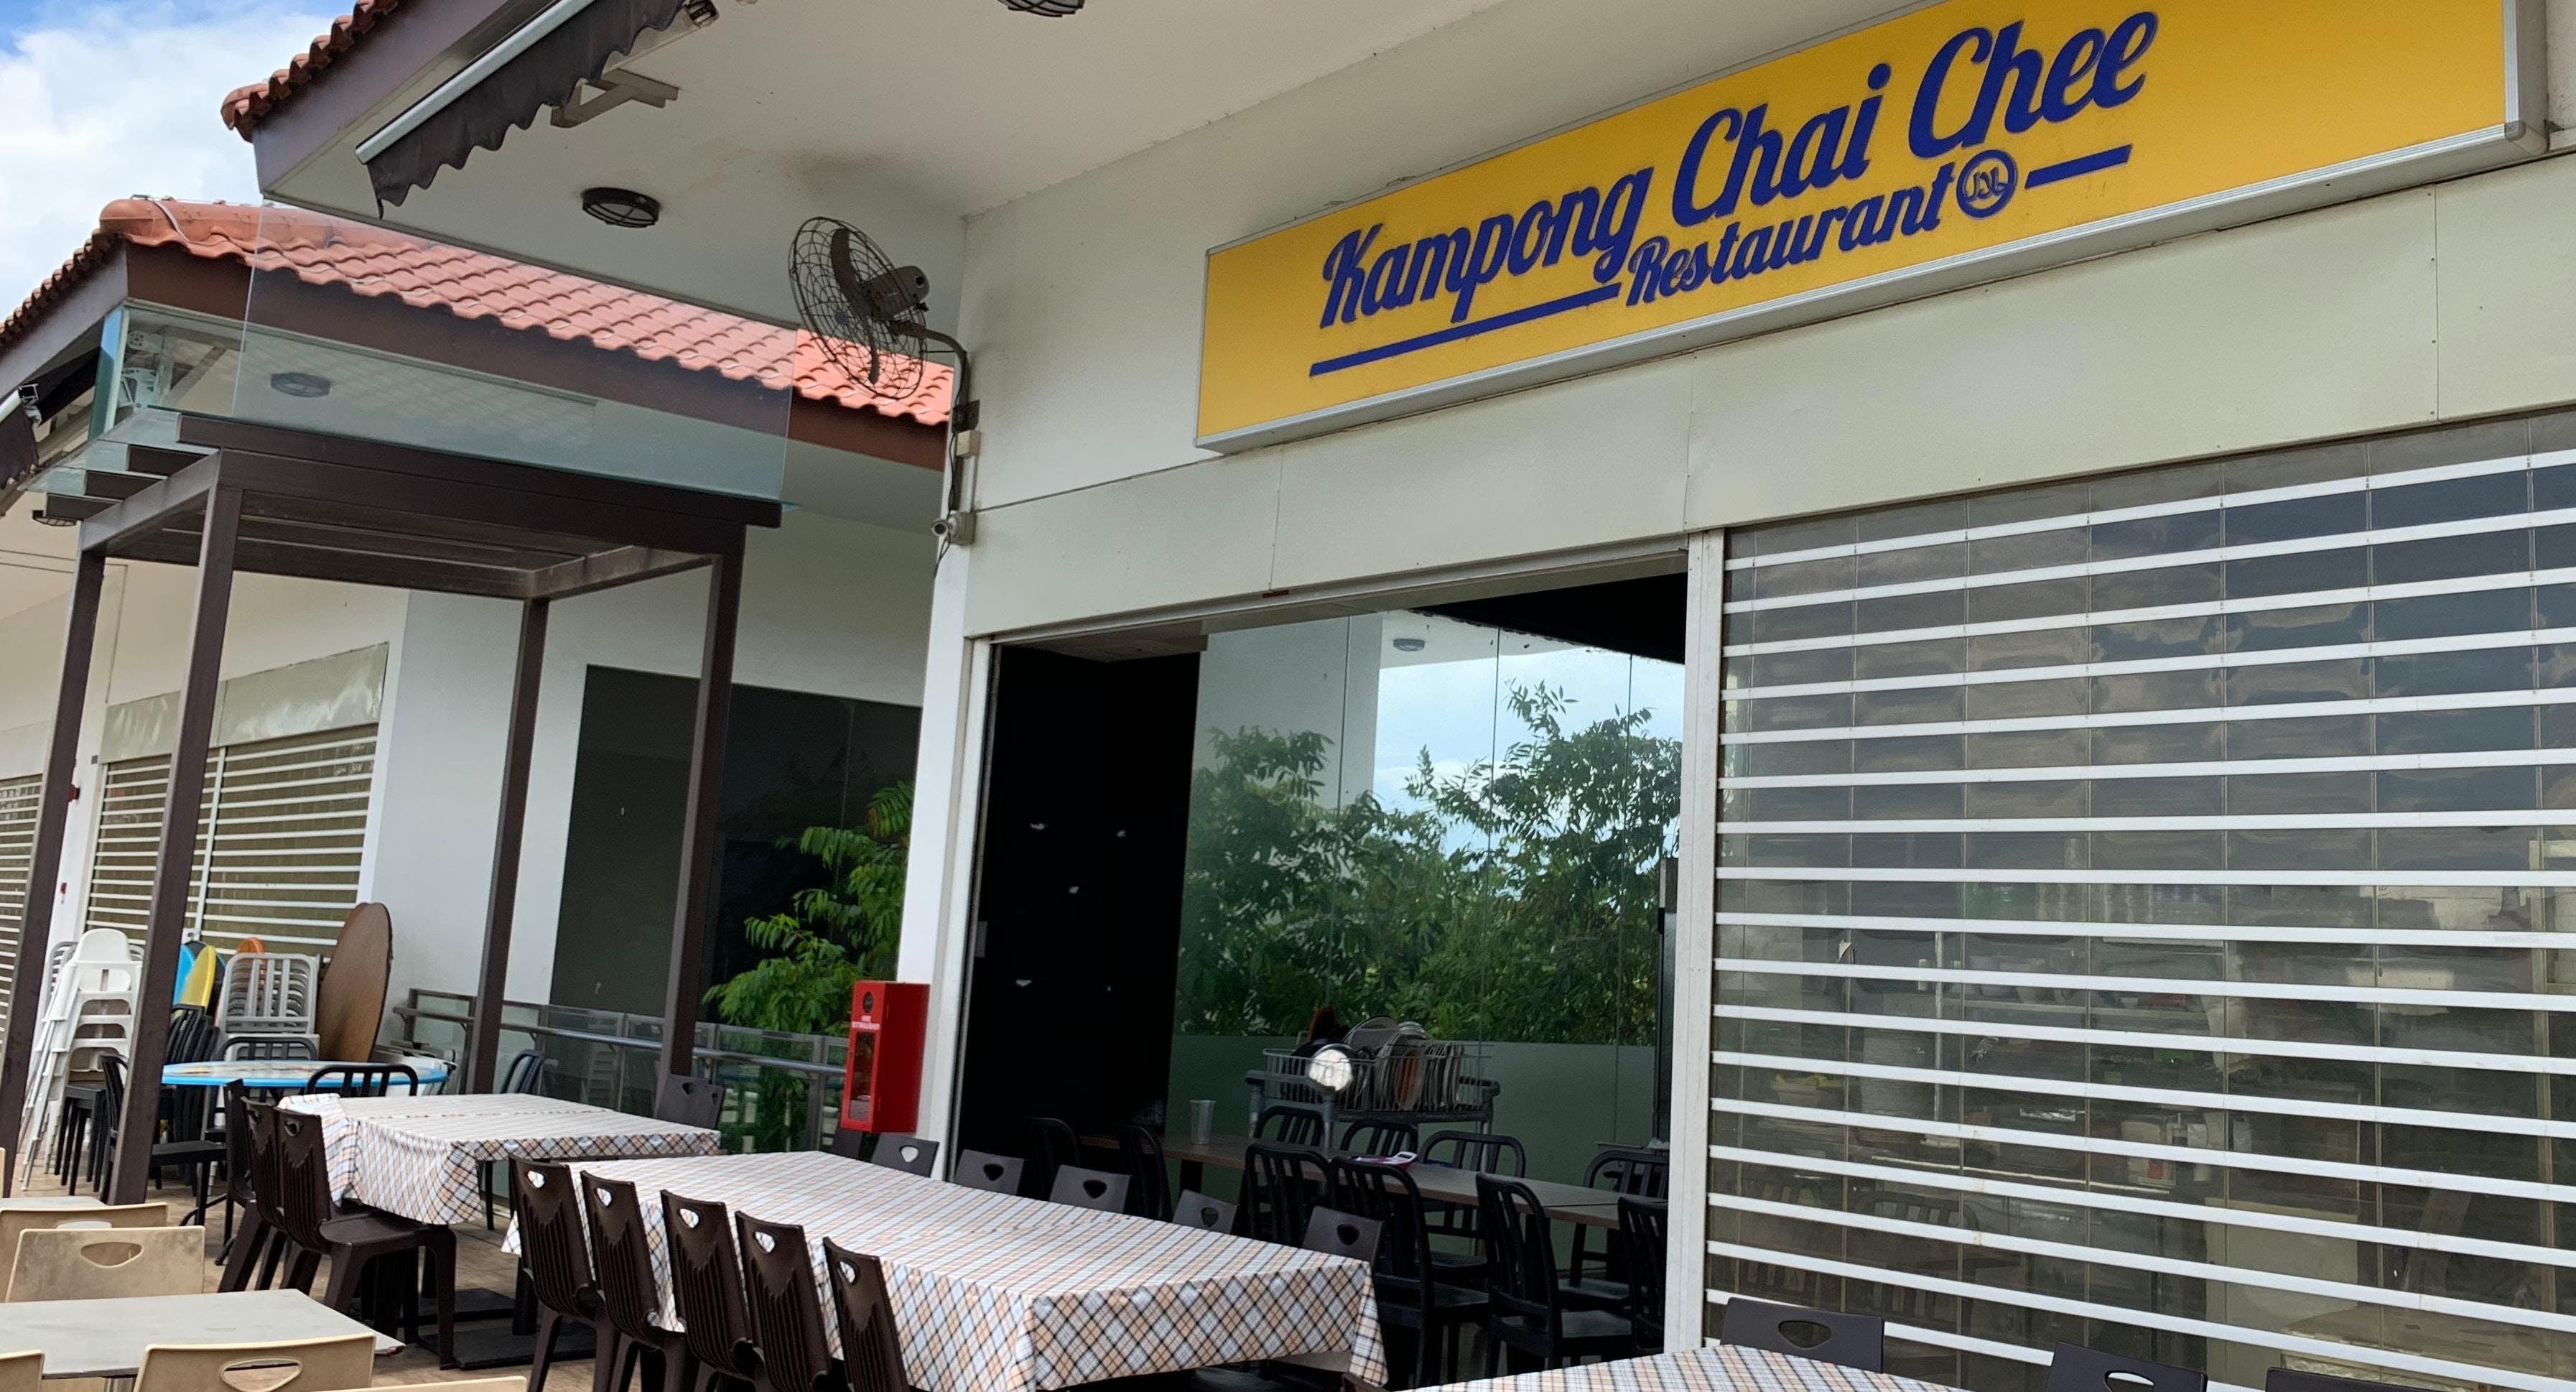 Kampong Chai Chee Restaurant - Punggol Singapore image 3